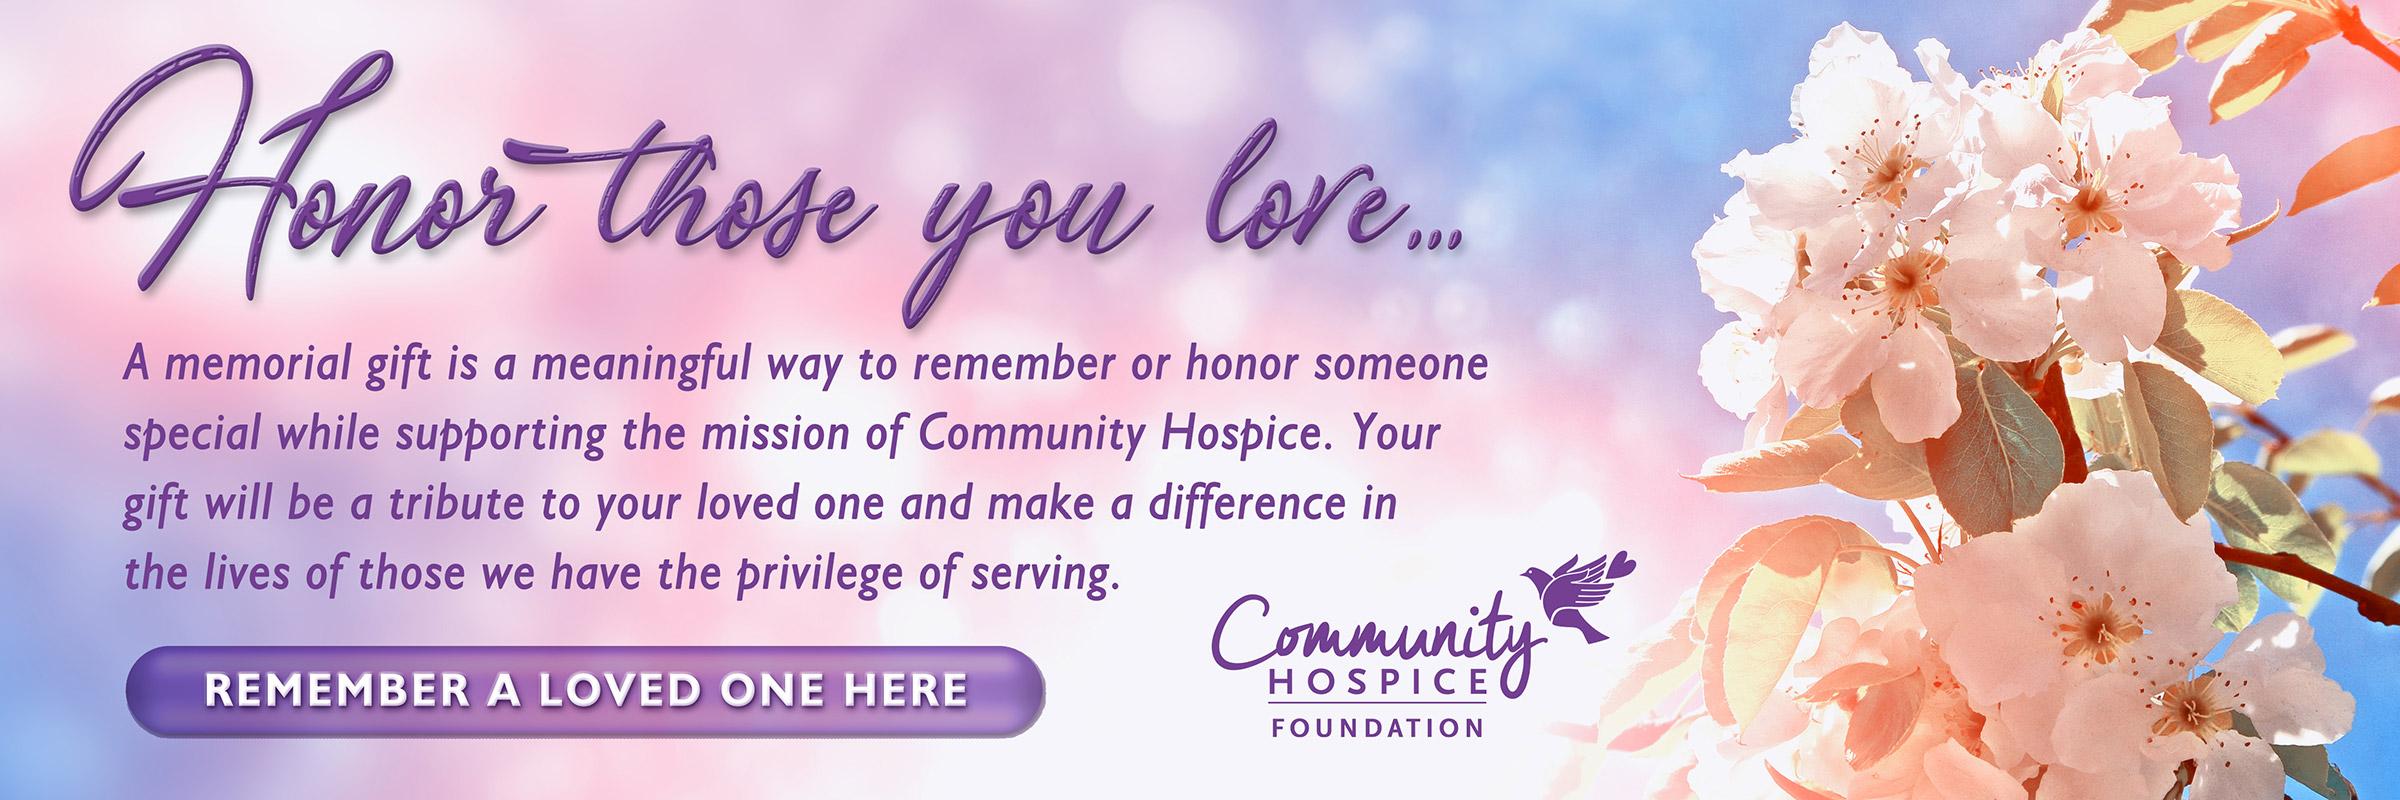 Memorial-Giving_Carousel